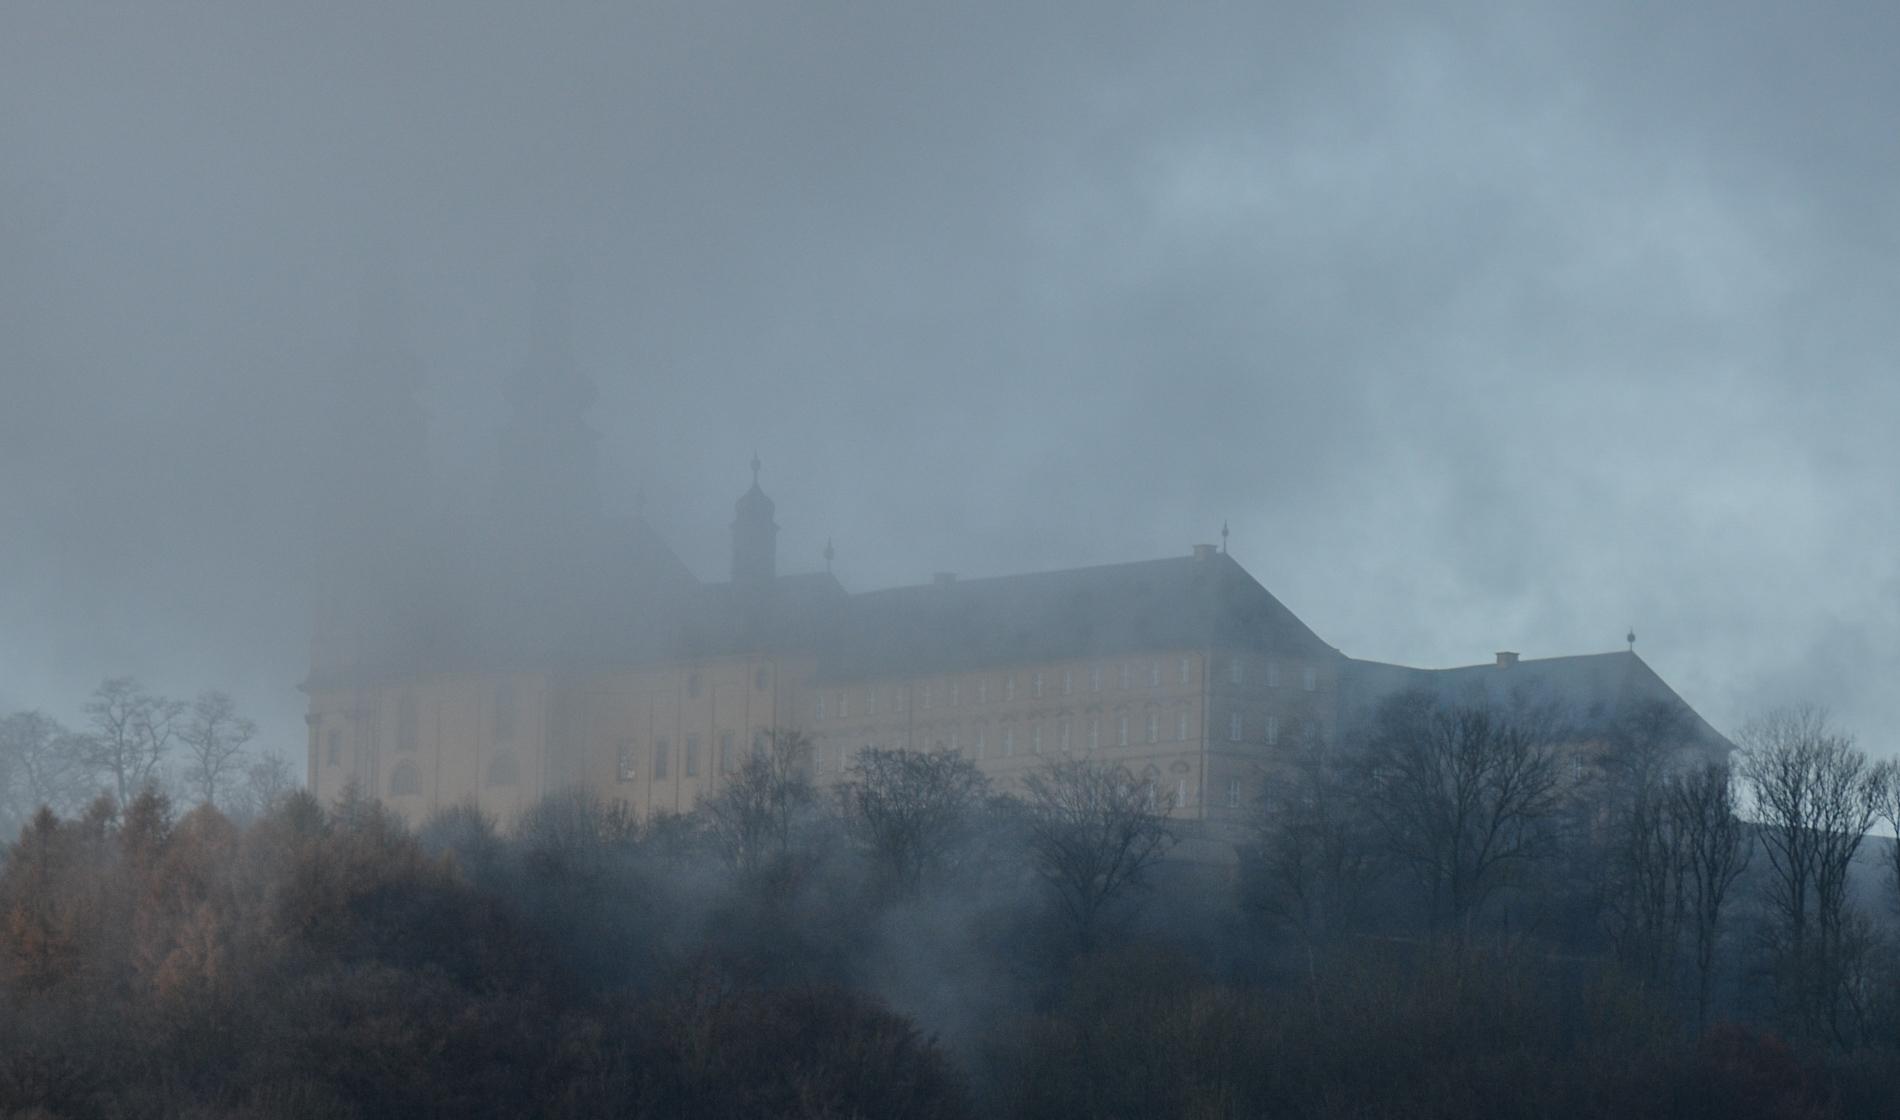 Kloster Banz